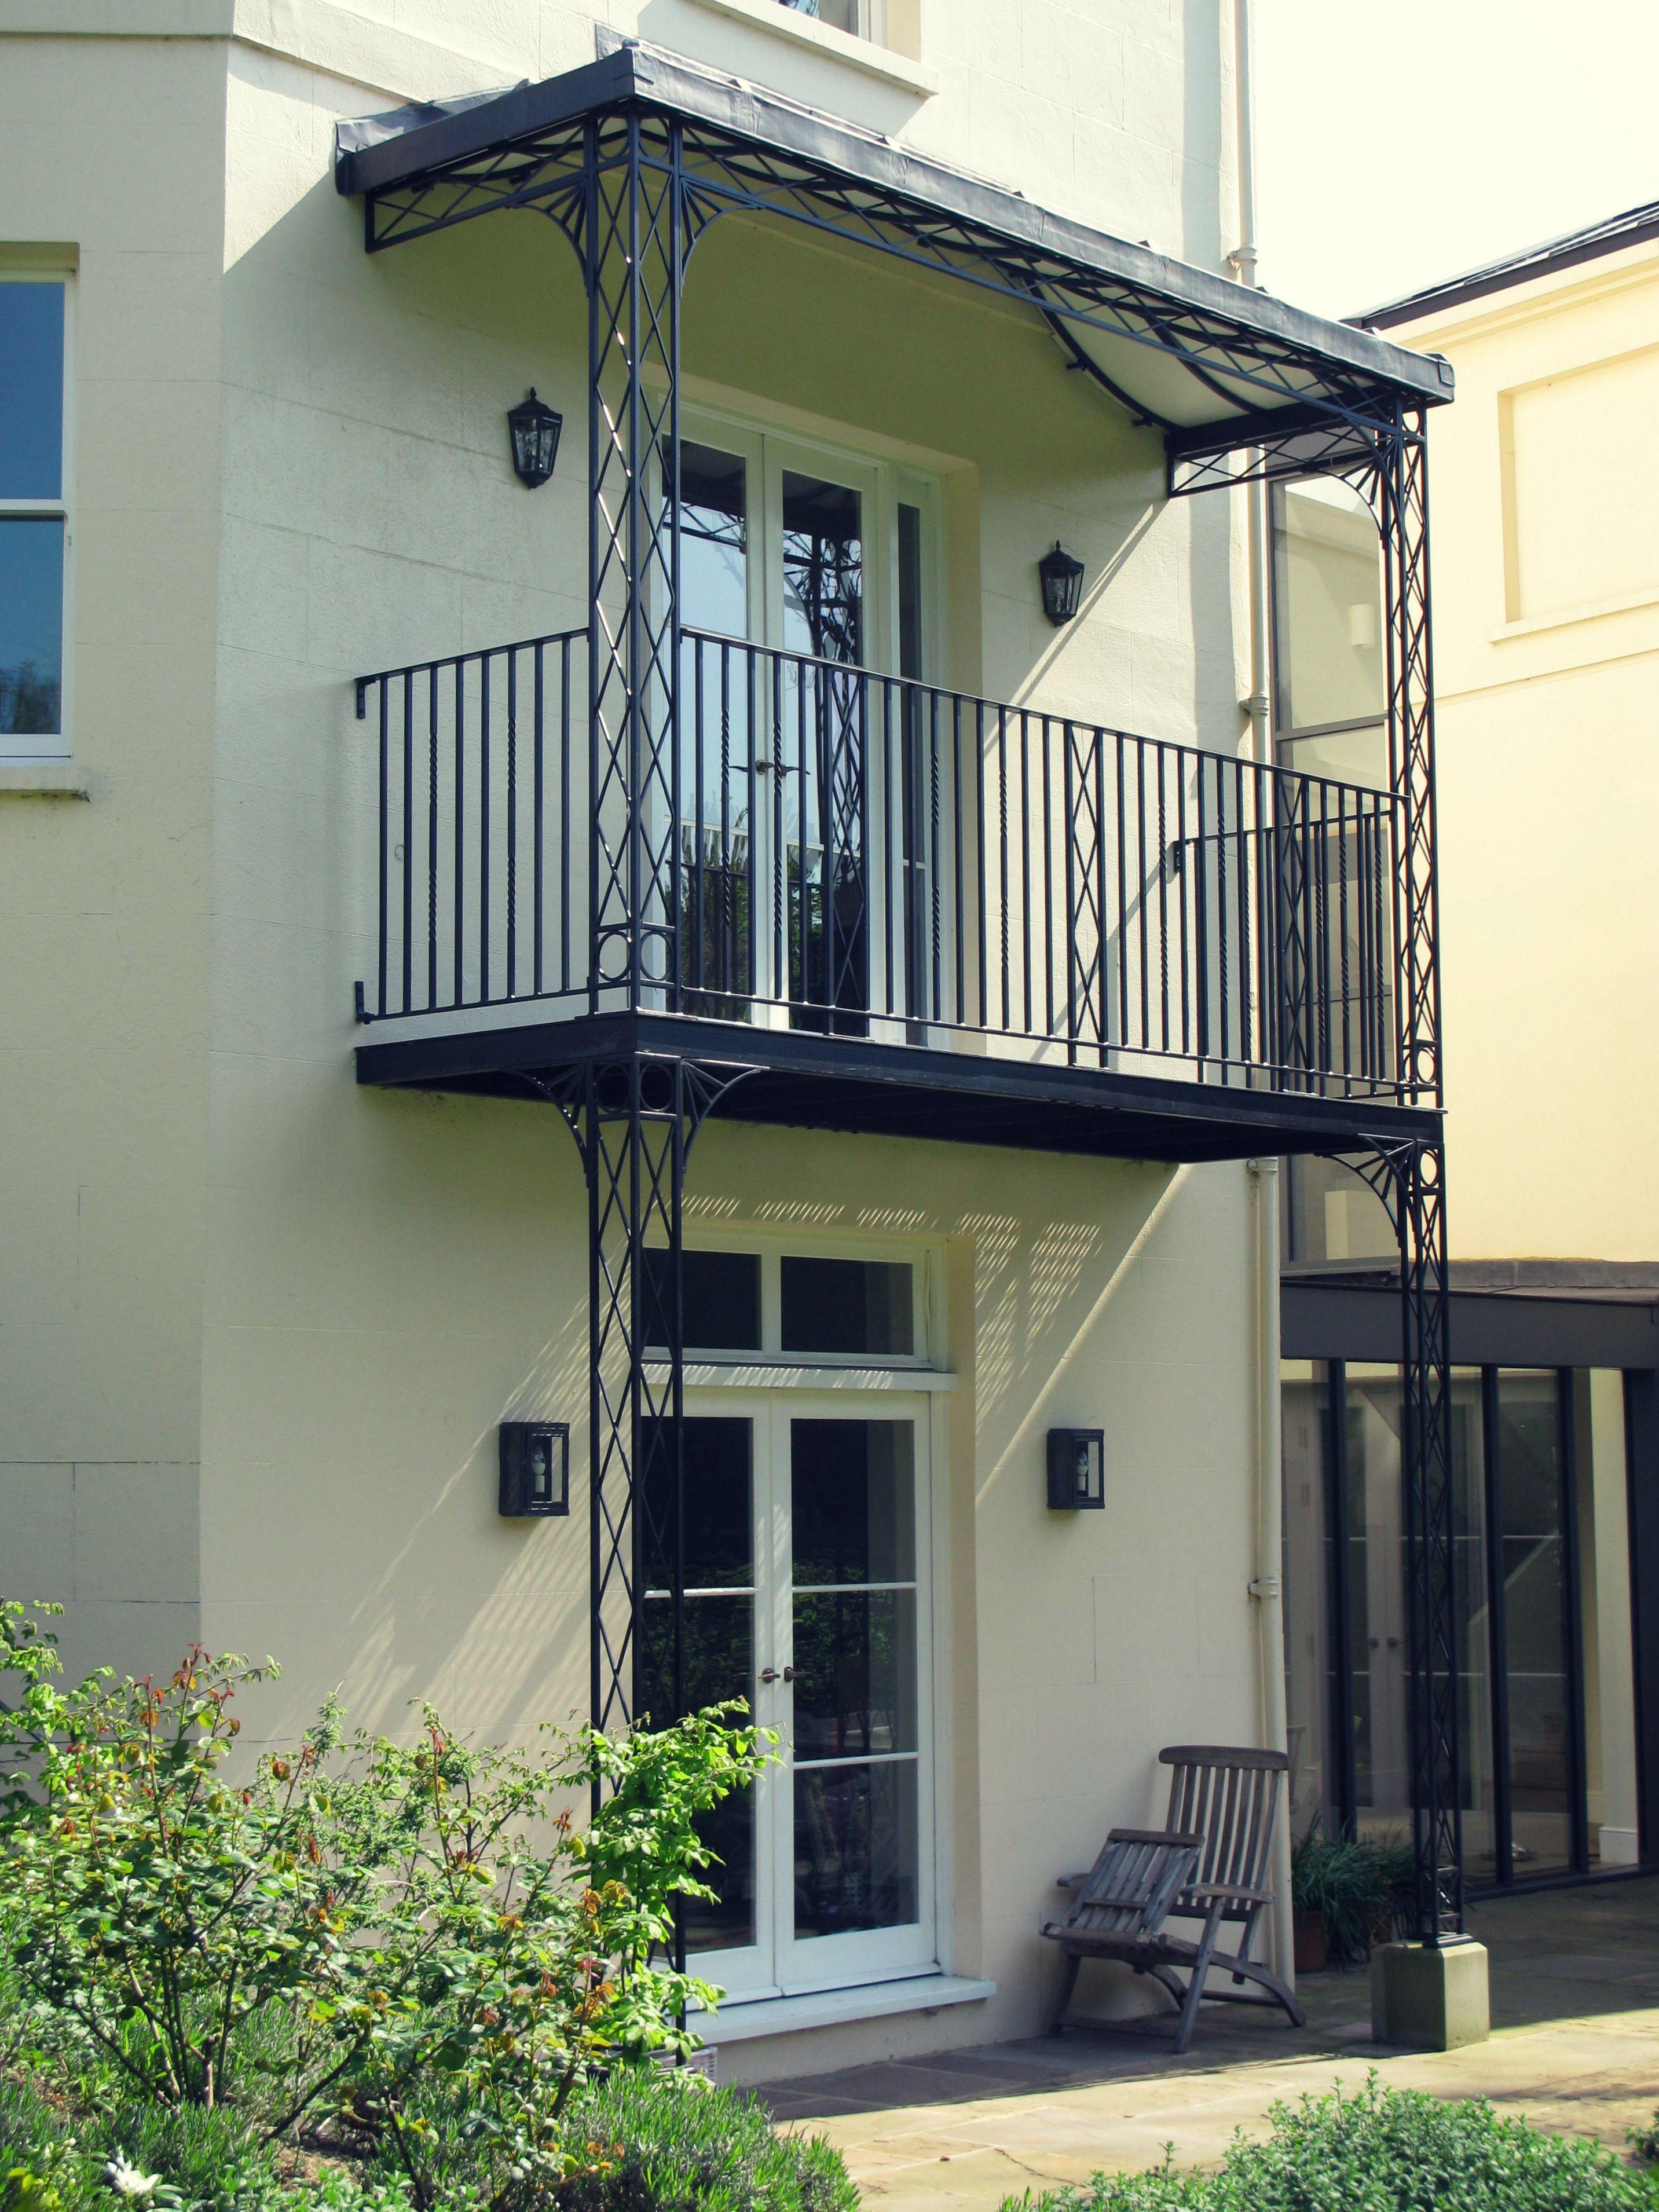 Two-Storey Balcony Veranda | Weranda | Pinterest | Verandas ...